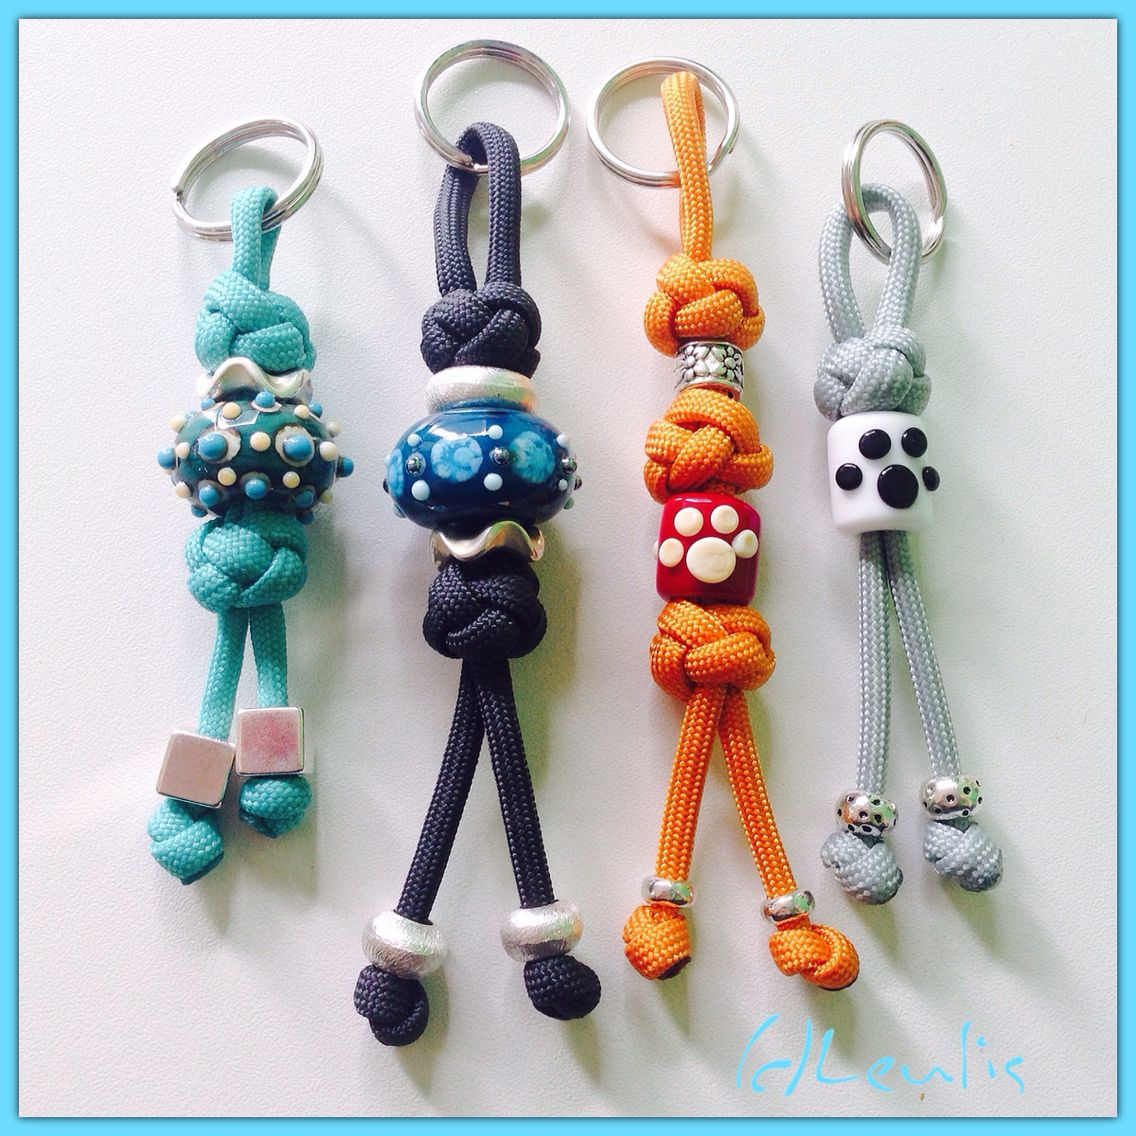 Cooles Taschen Accessoires Leder Bommeln Anhänger Schlüsselanhänger Geflochten